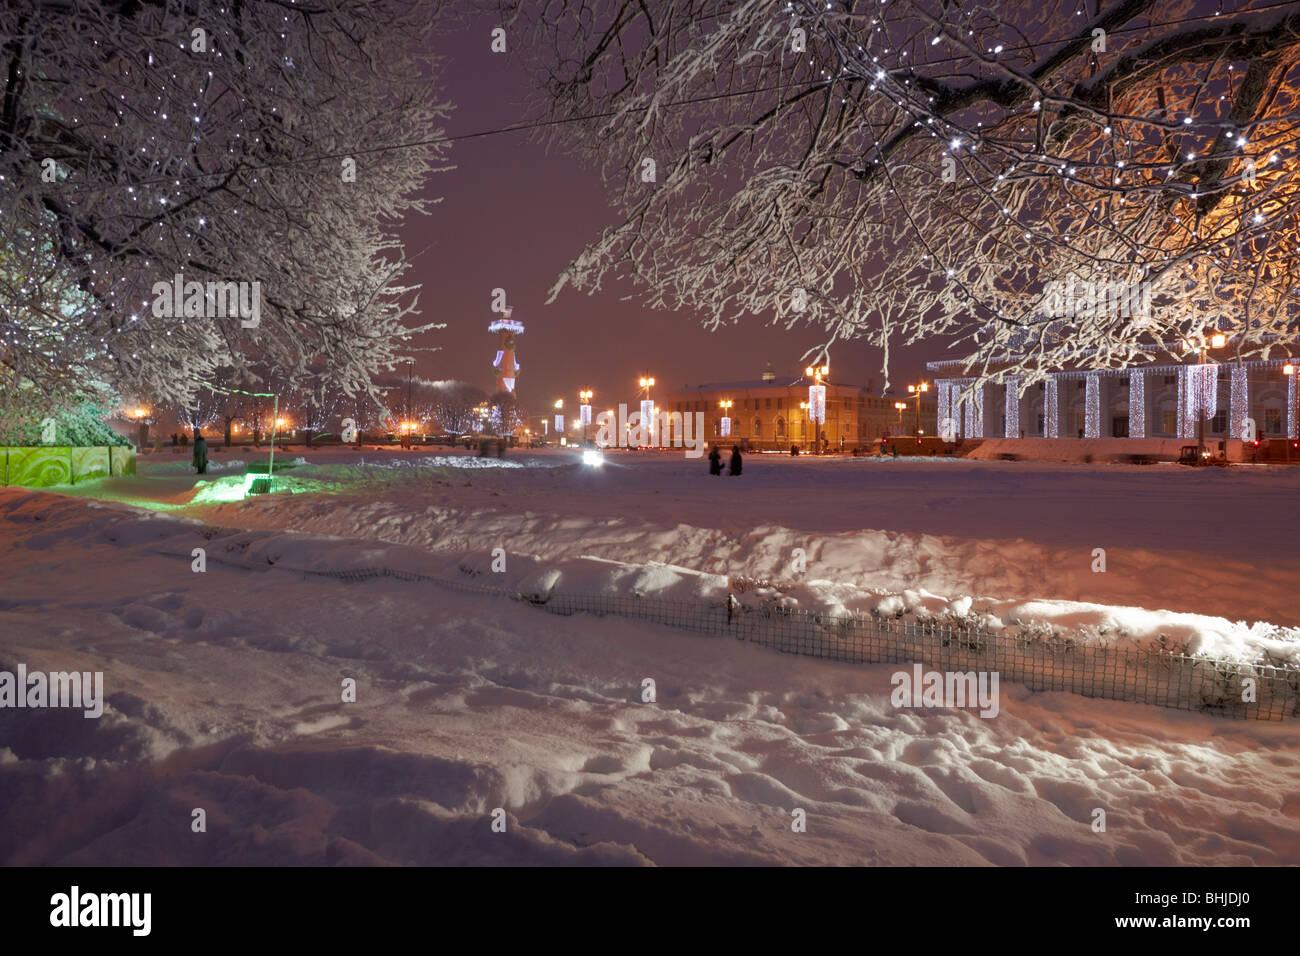 New Year illumination at the Spit of Vasilyevsky Island. - Stock Image